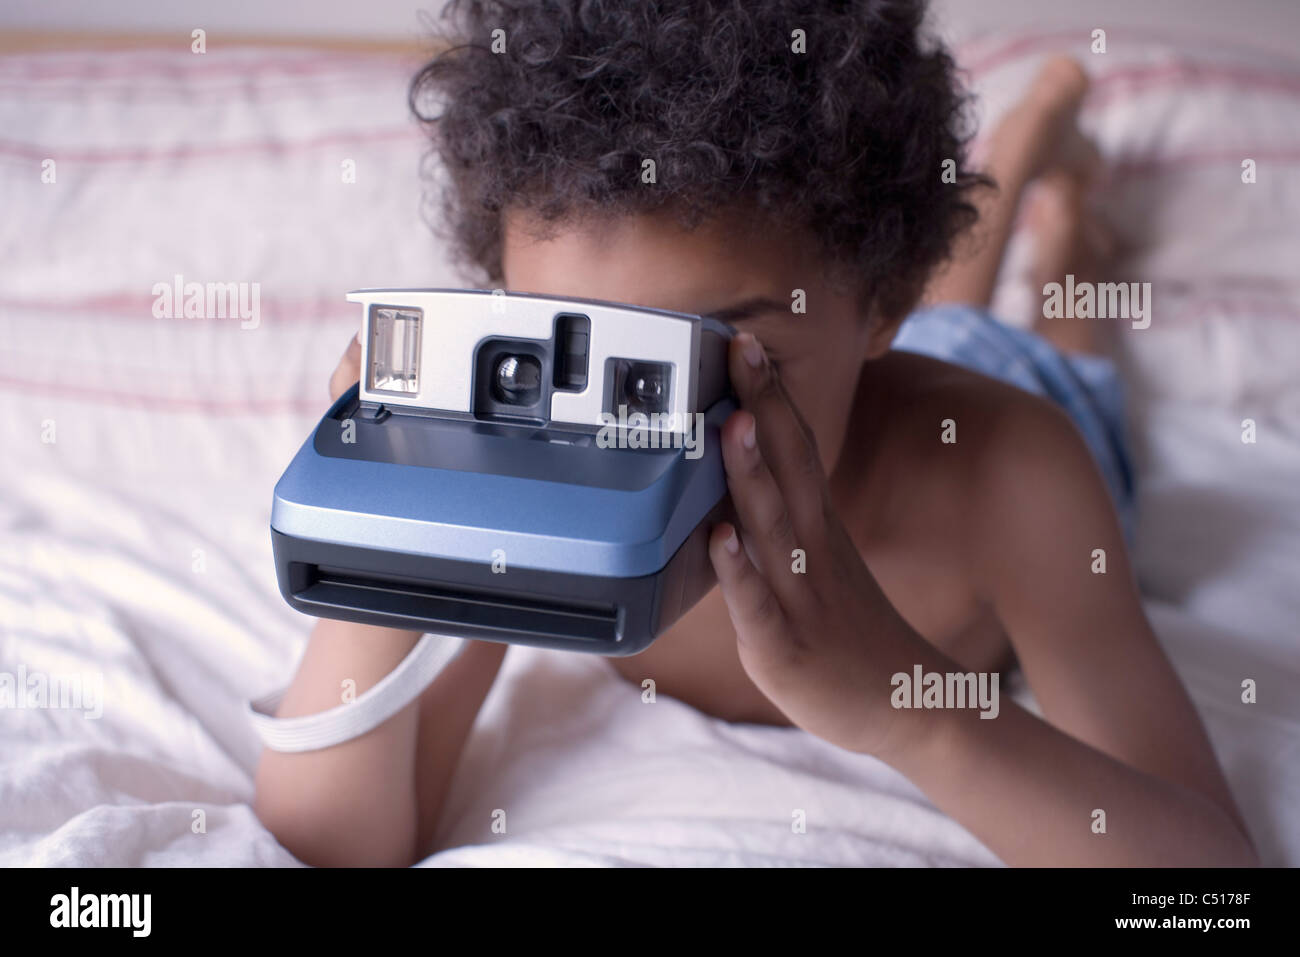 Liitle boy holding instant camera Stock Photo